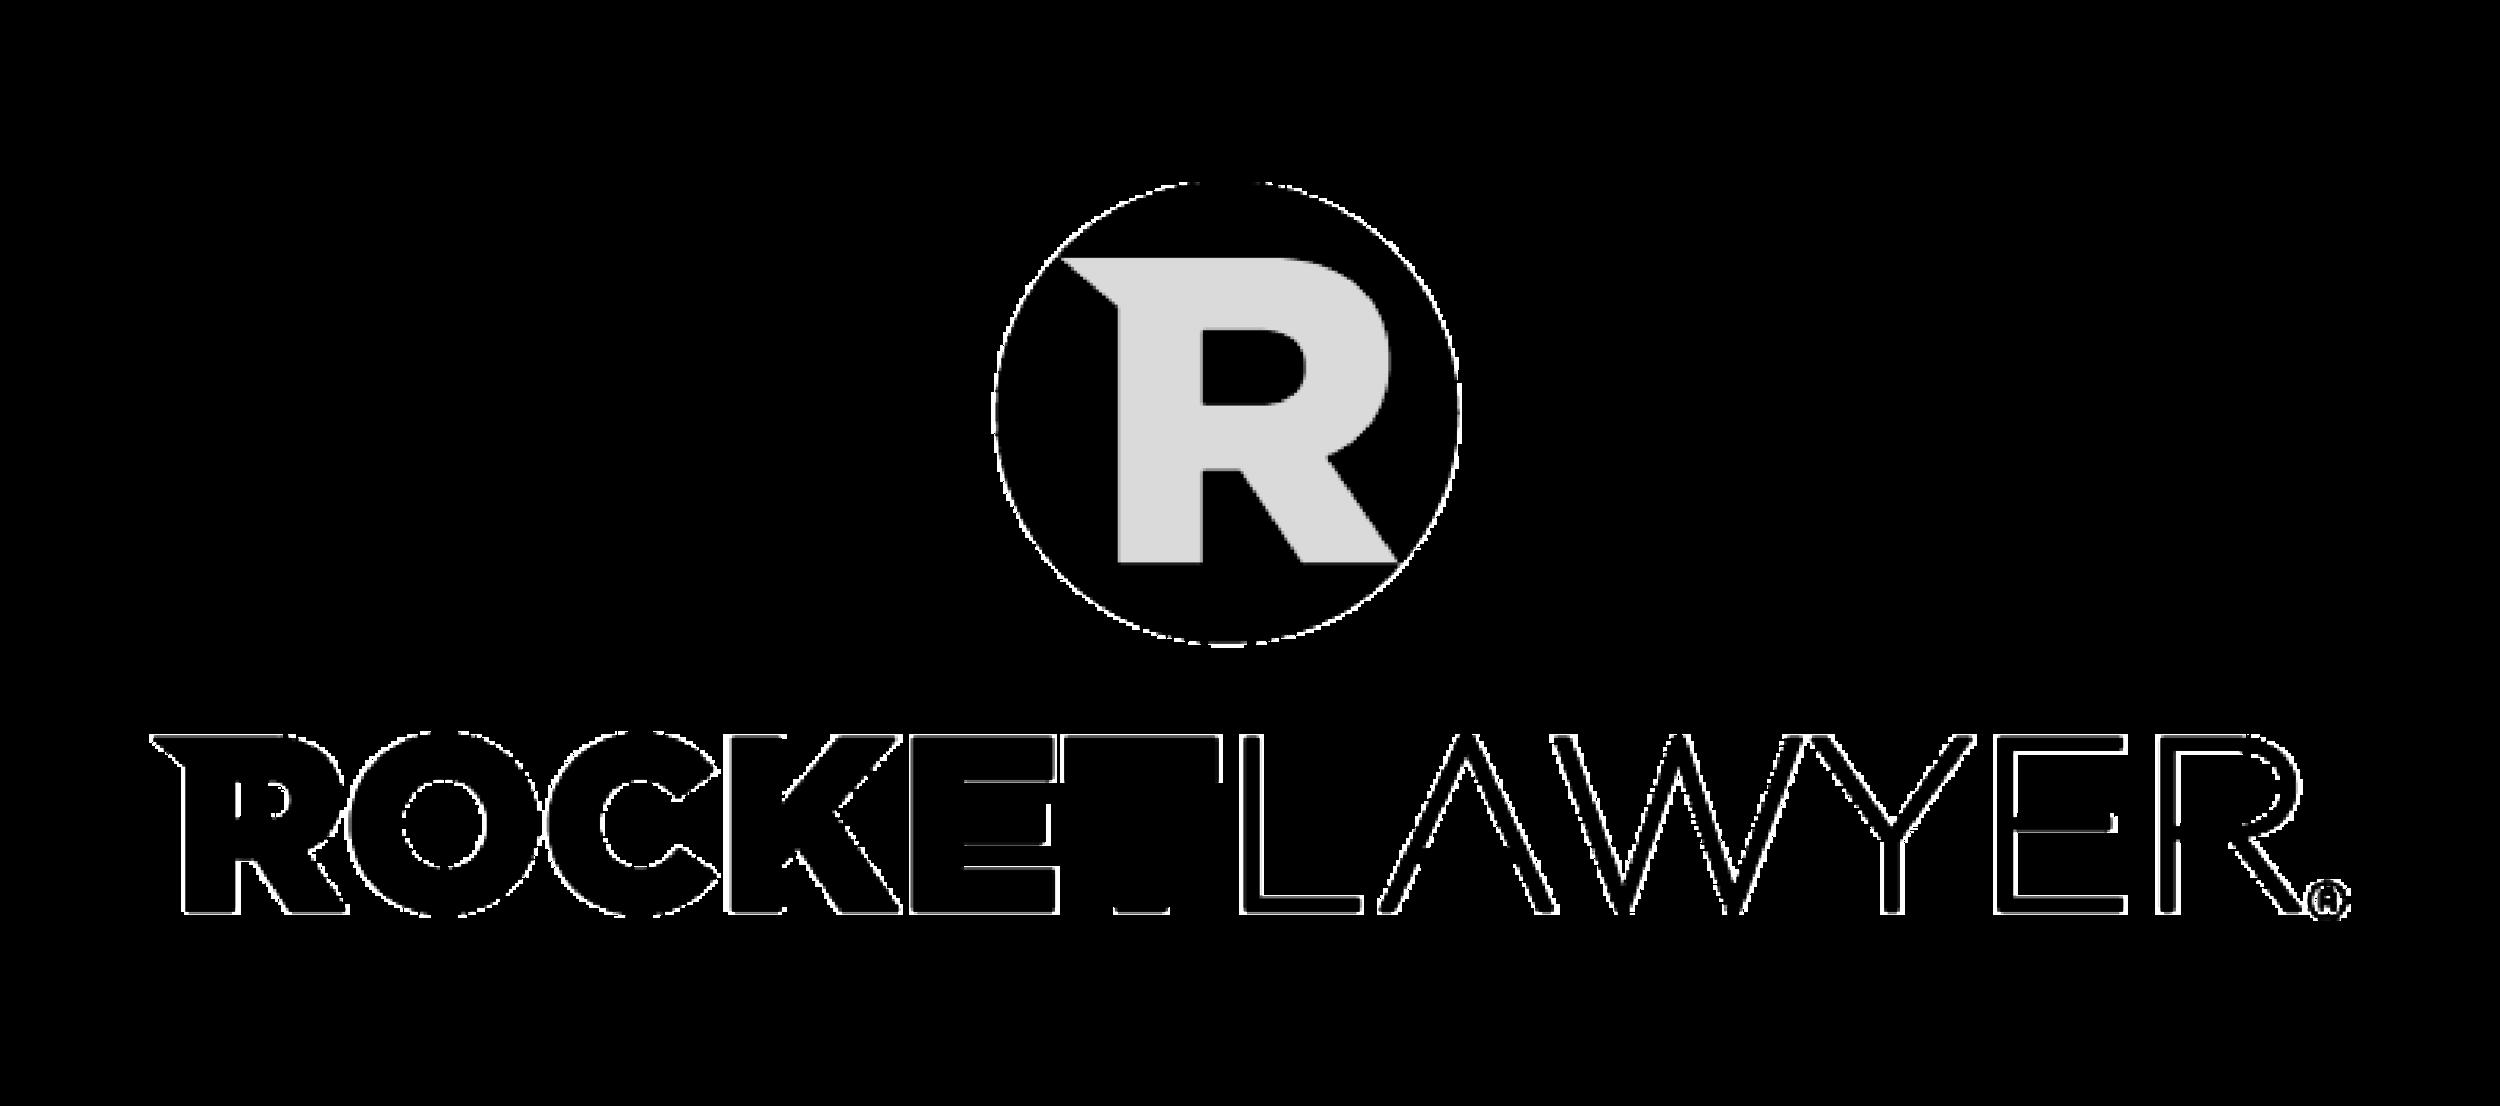 Rocket Lawyer-01.png